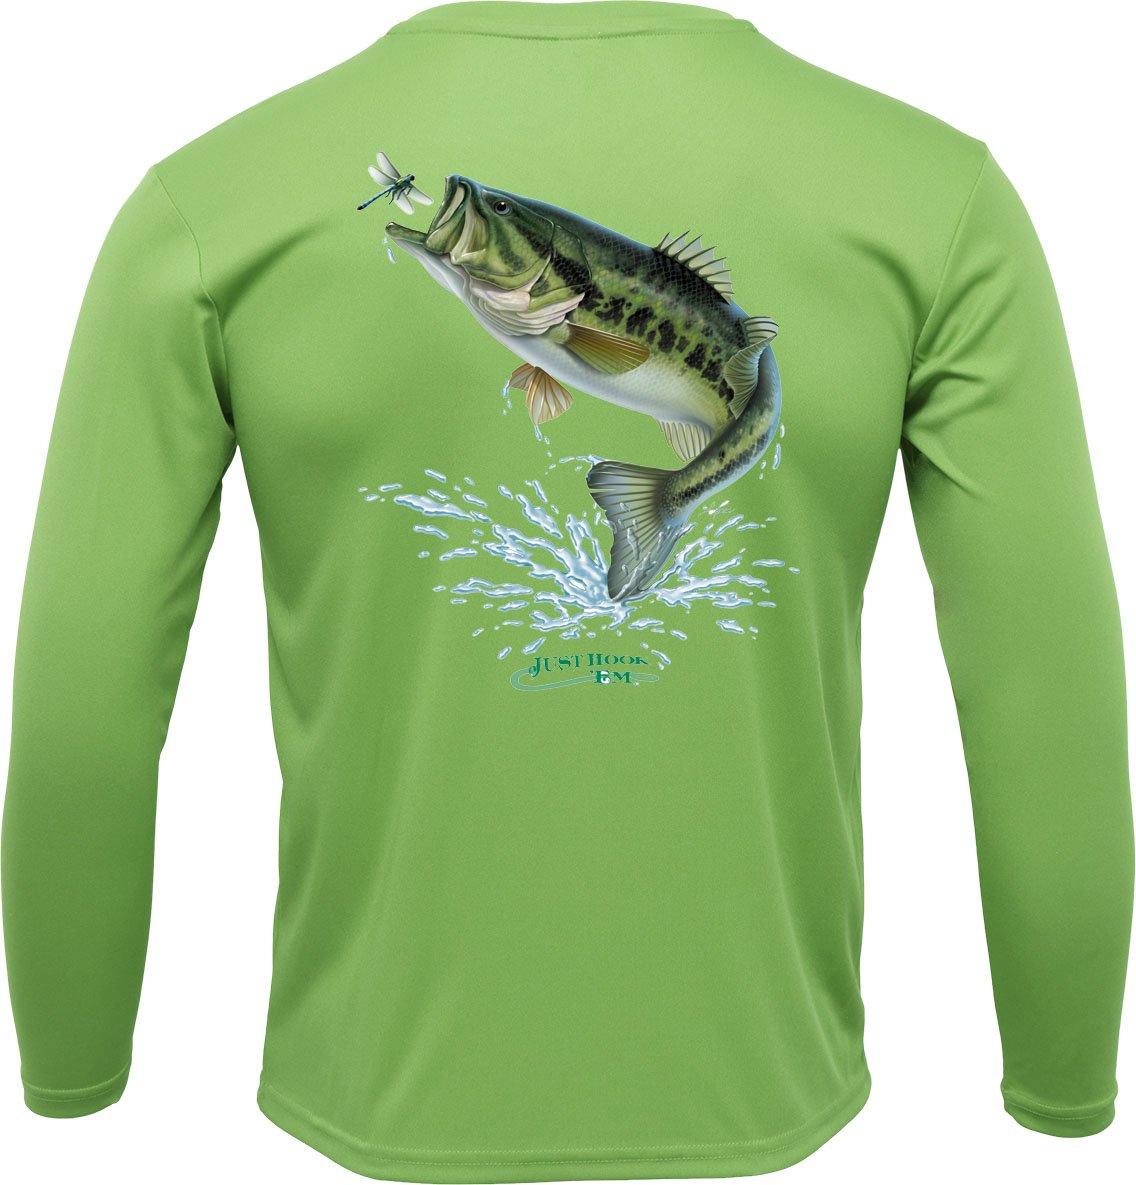 Image of Sublimated L/S Just Hook 'Em™ Performance Bass Shirt - Olive